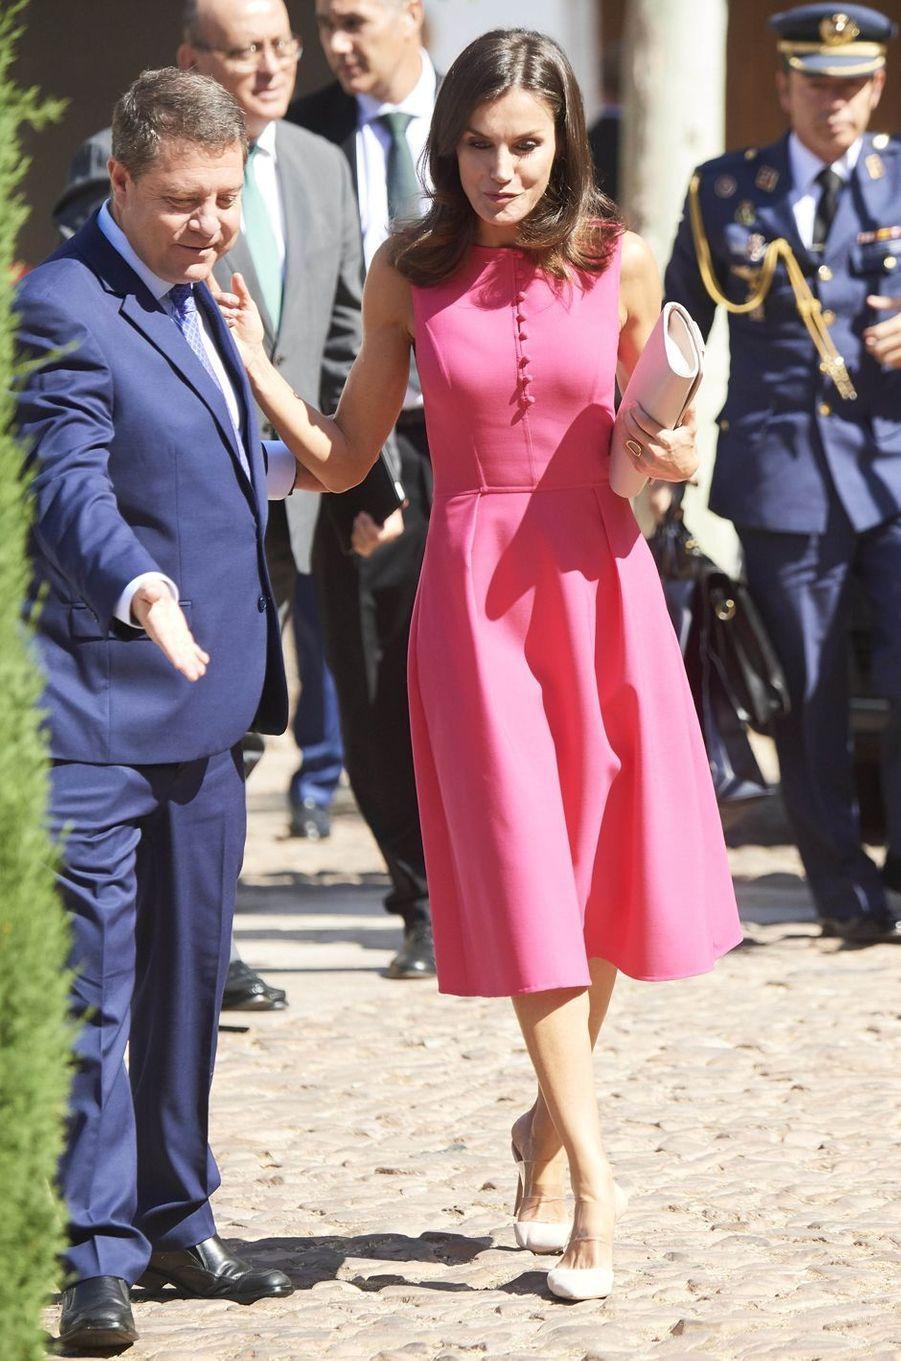 La reine Letizia d'Espagne en Carolina Herrera à Almagro, le 9 juillet 2019